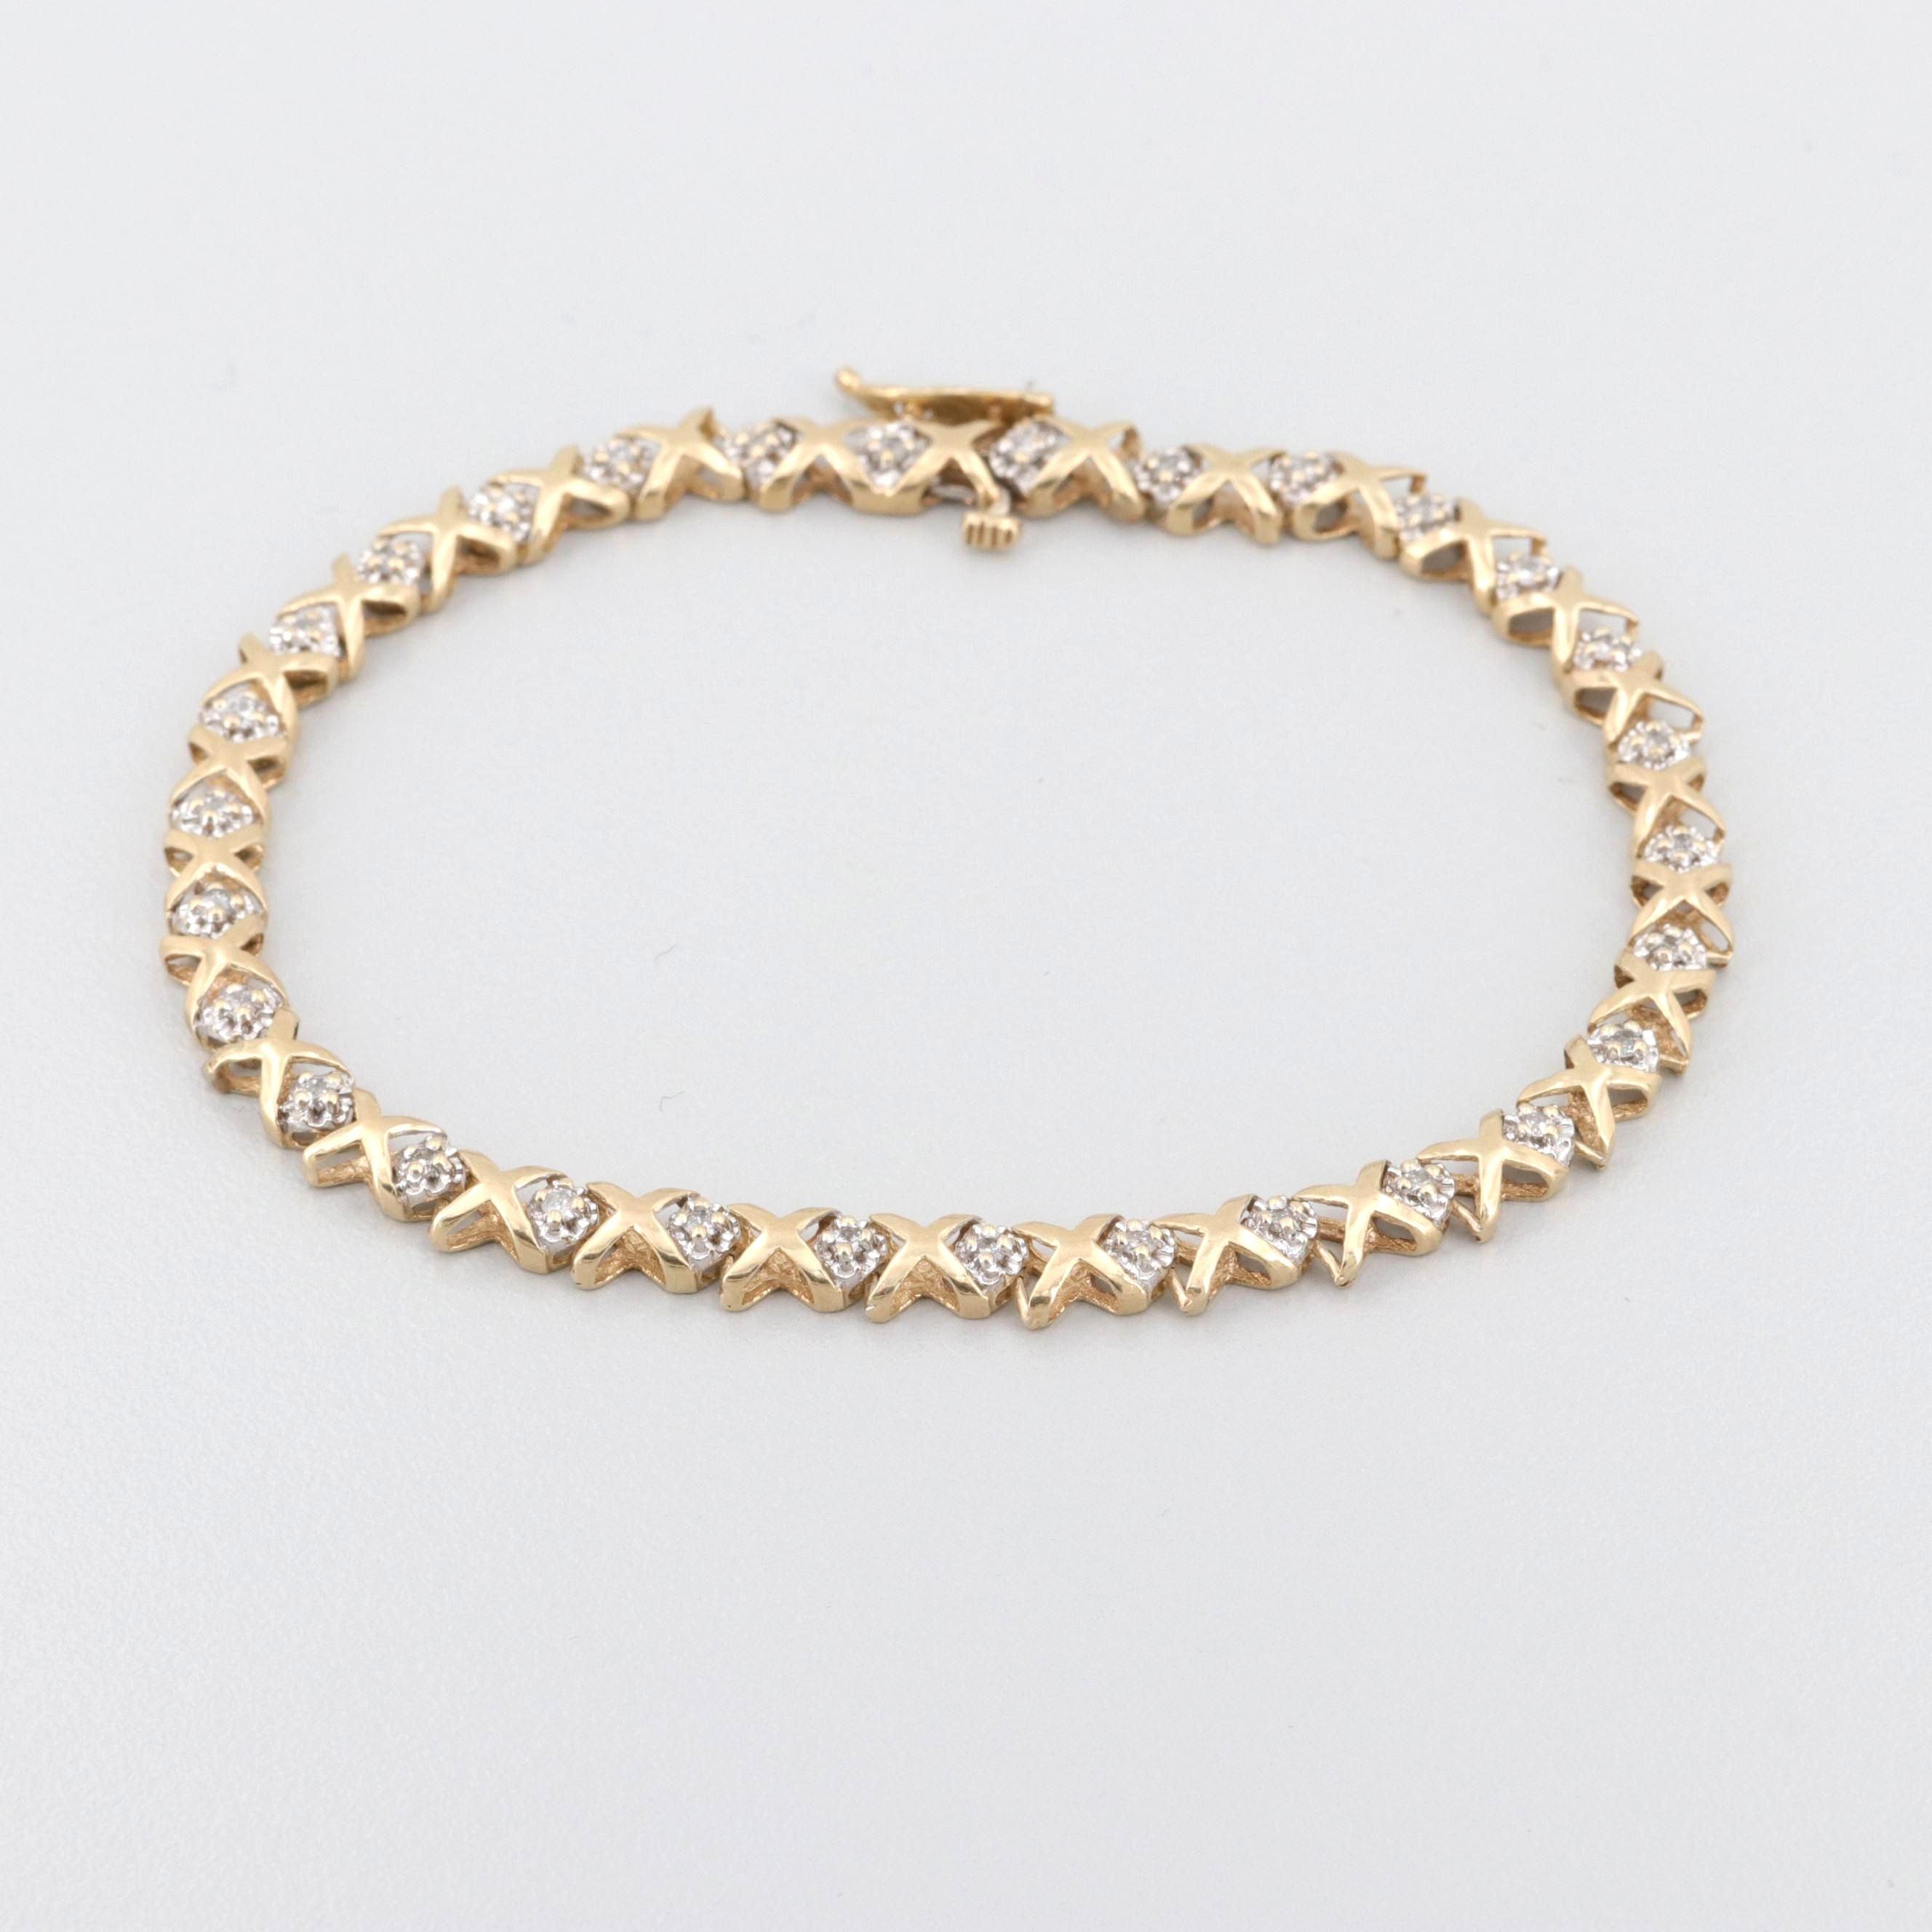 10K Yellow and White Gold Diamond X-Link Tennis Bracelet